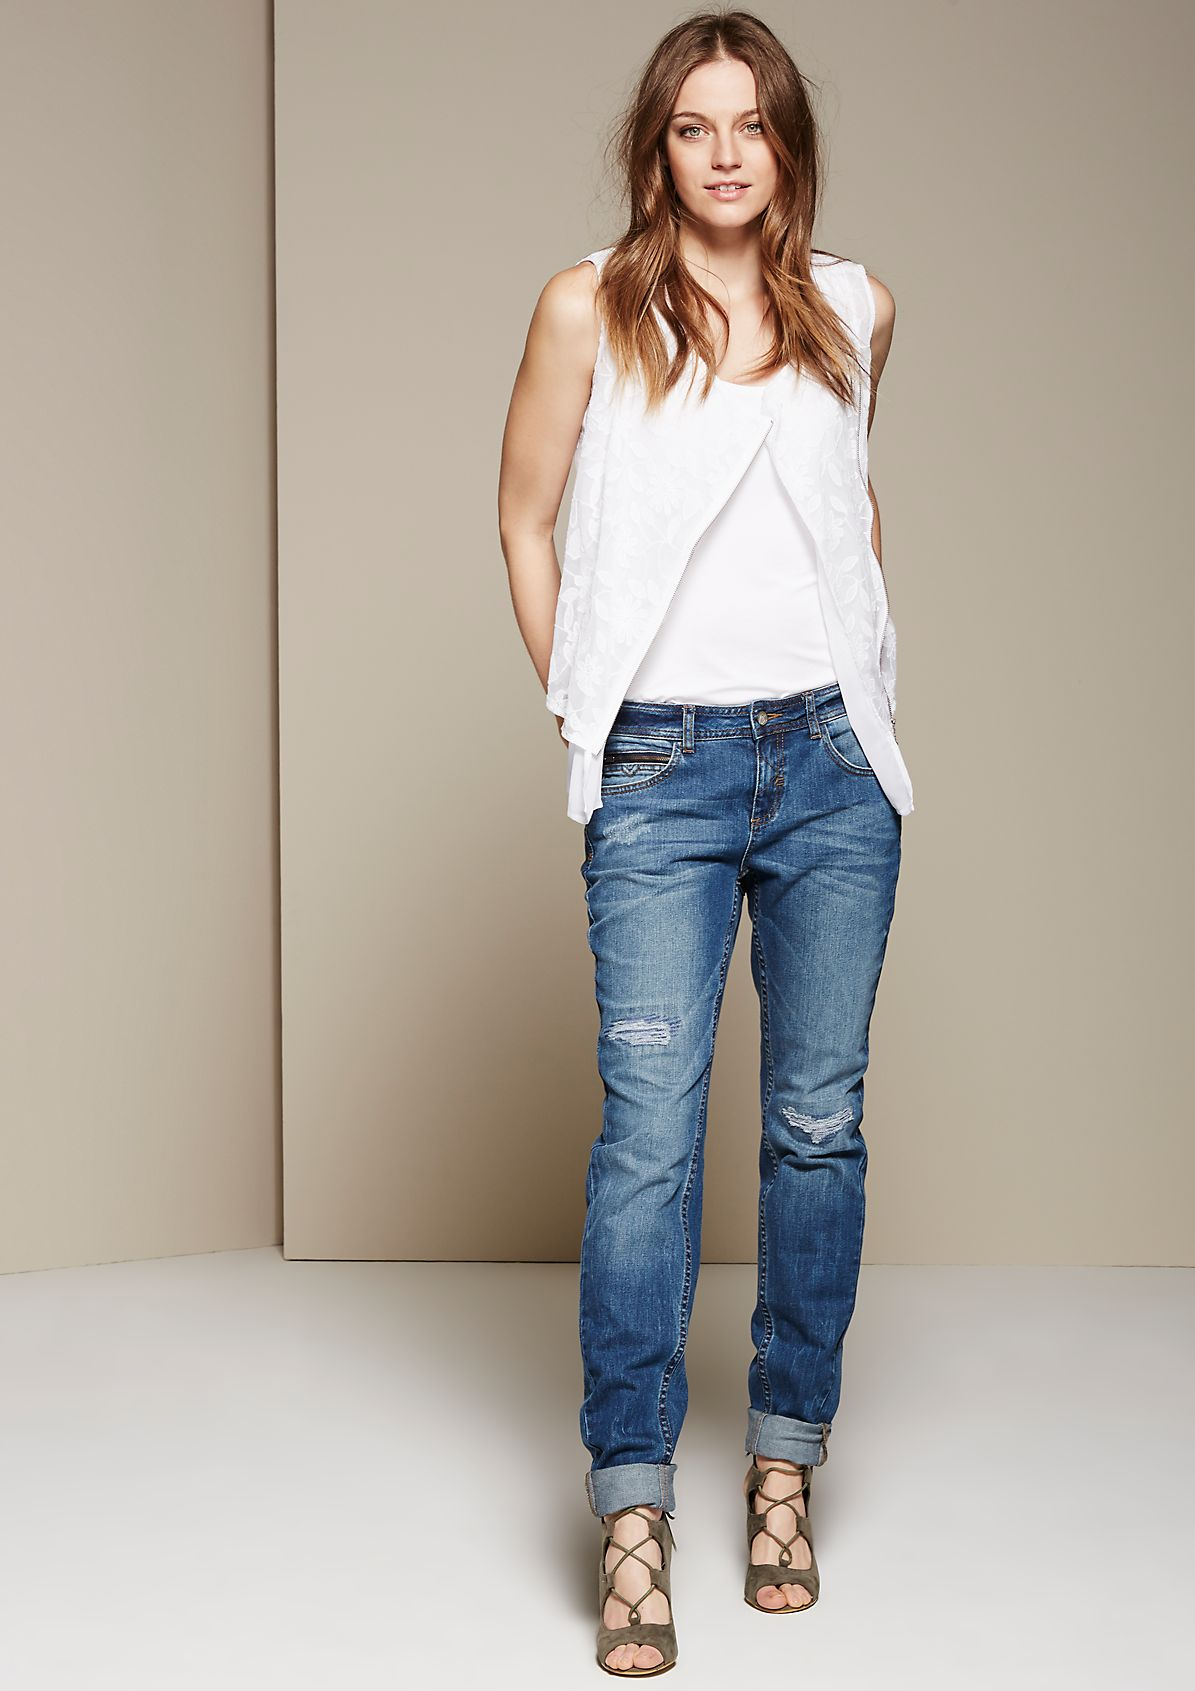 boyfriend jeans fashion mode comma online store. Black Bedroom Furniture Sets. Home Design Ideas